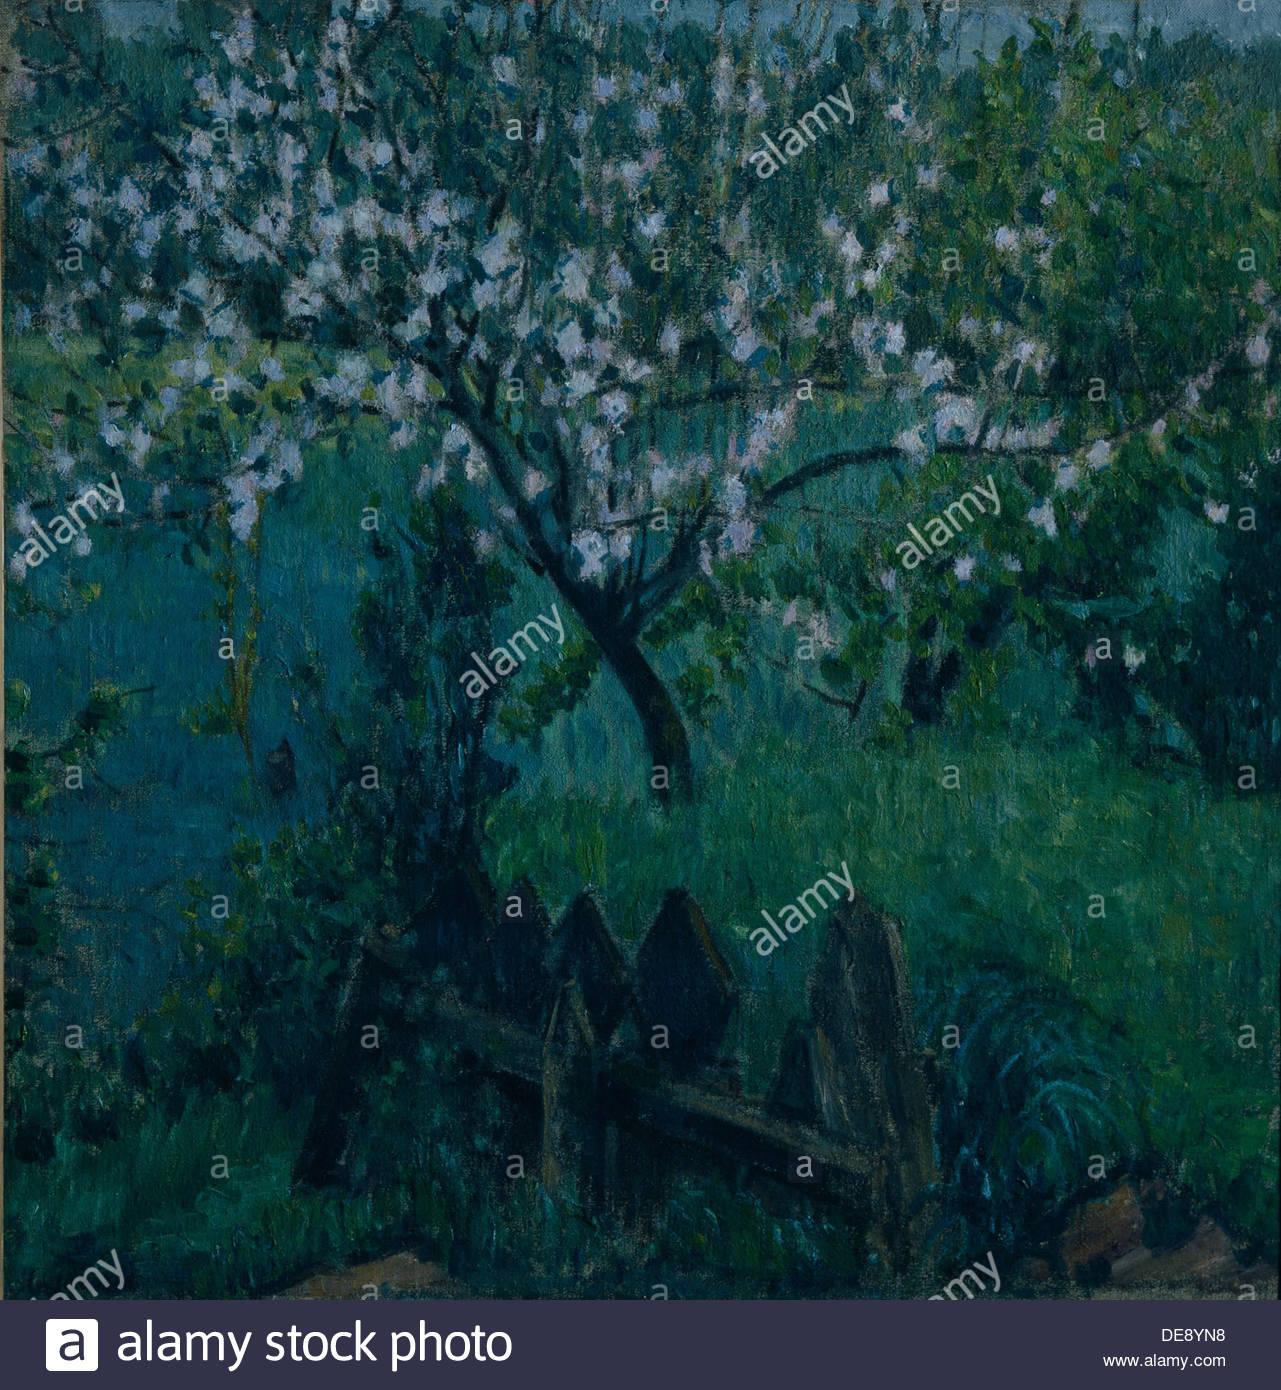 Apple Tree After Rain, 1906. Artist: Larionov, Mikhail Fyodorovich (1881-1964) - Stock Image